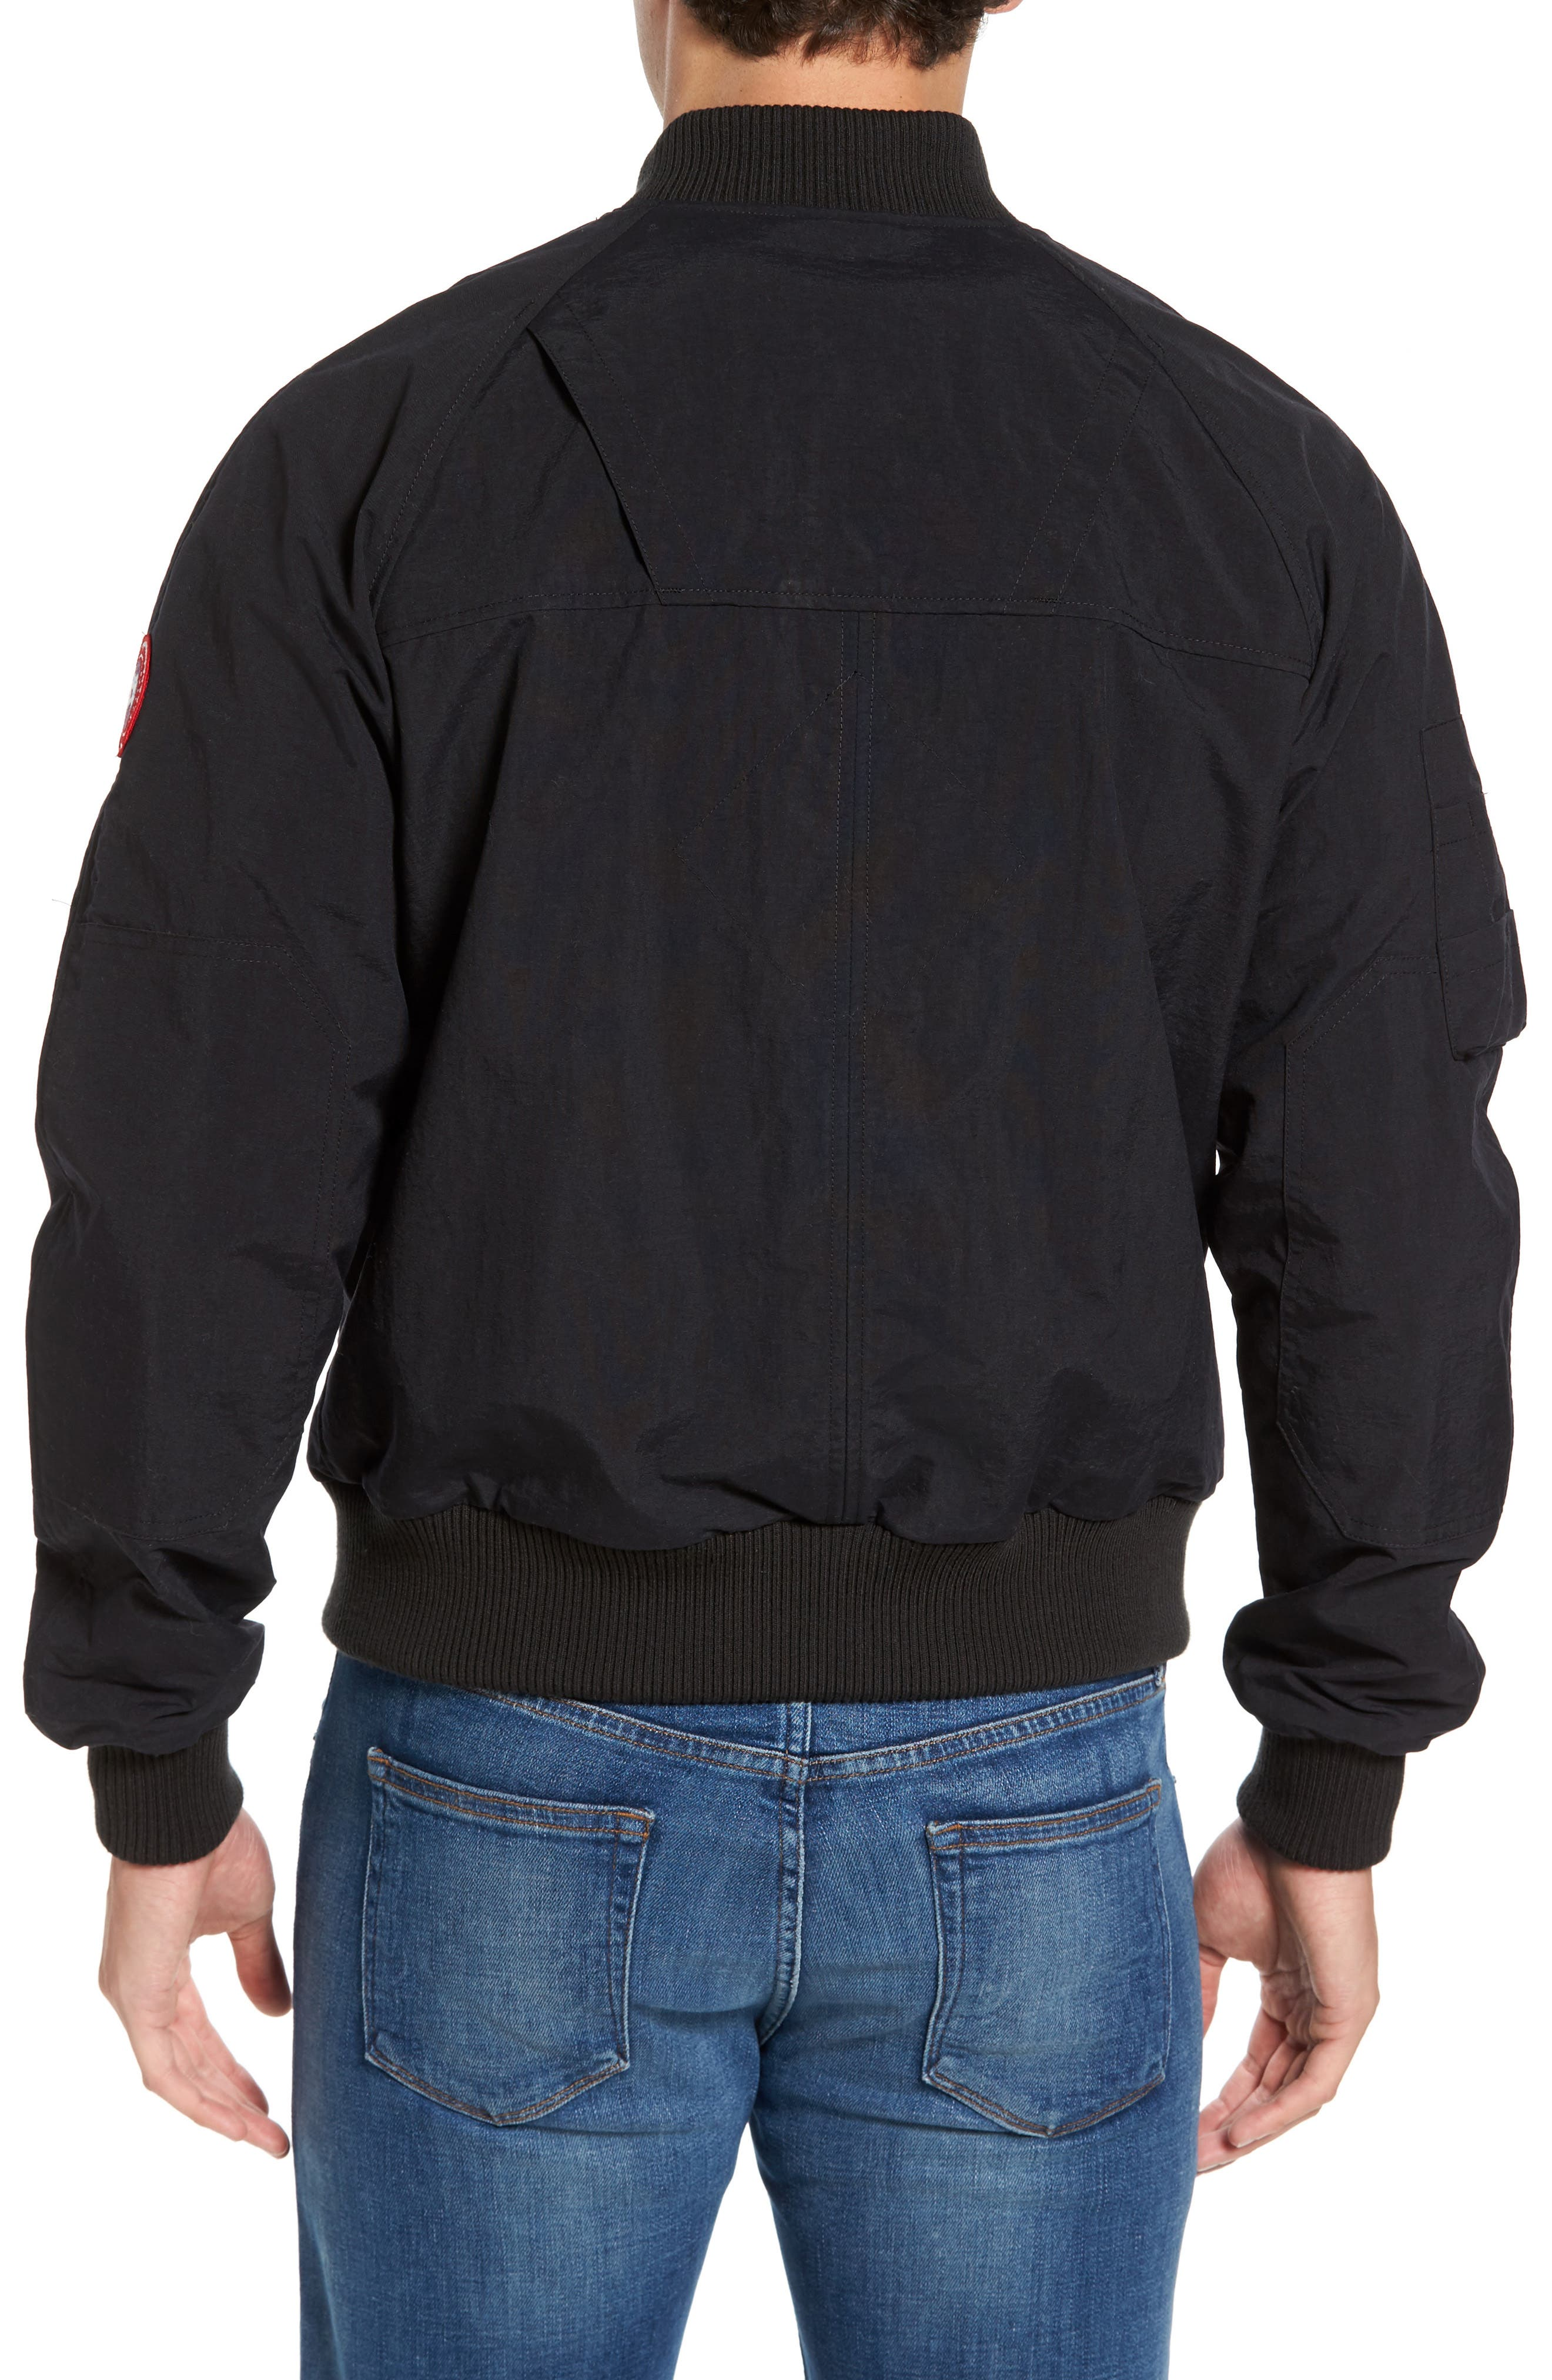 Faber Slim Fit Bomber Jacket,                             Alternate thumbnail 2, color,                             BLACK